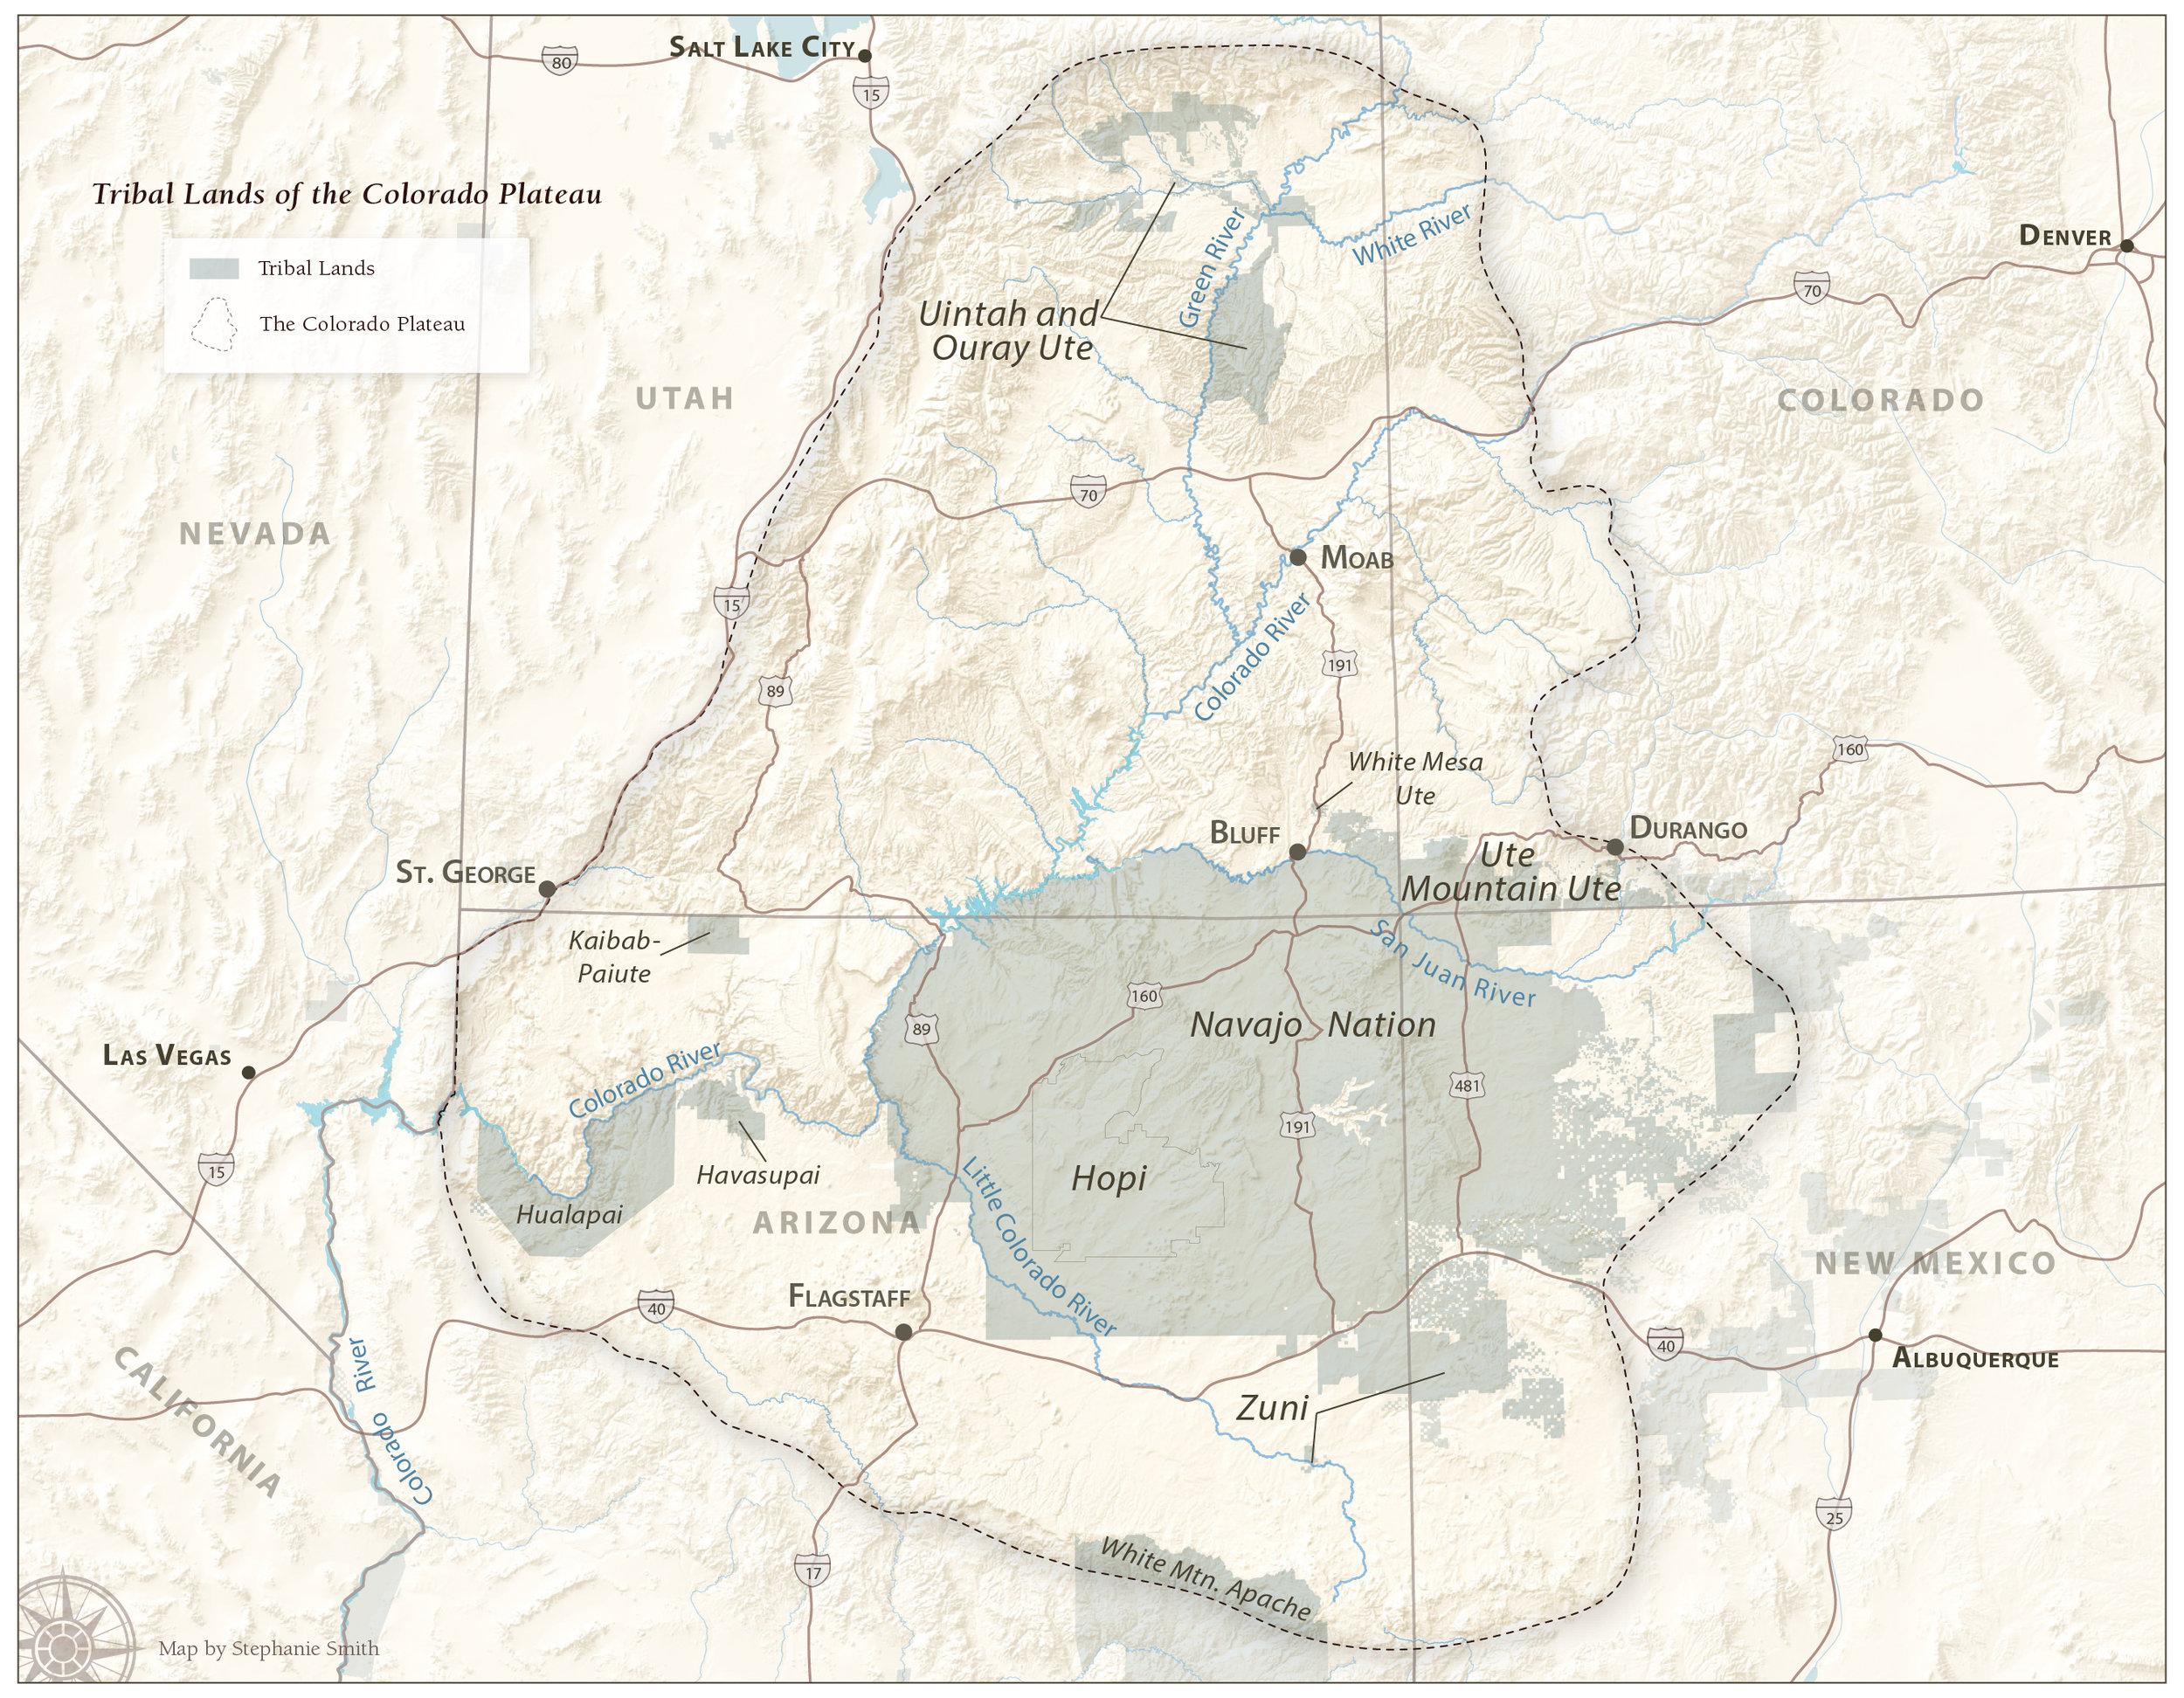 Tribal Lands on the Colorado Plateau